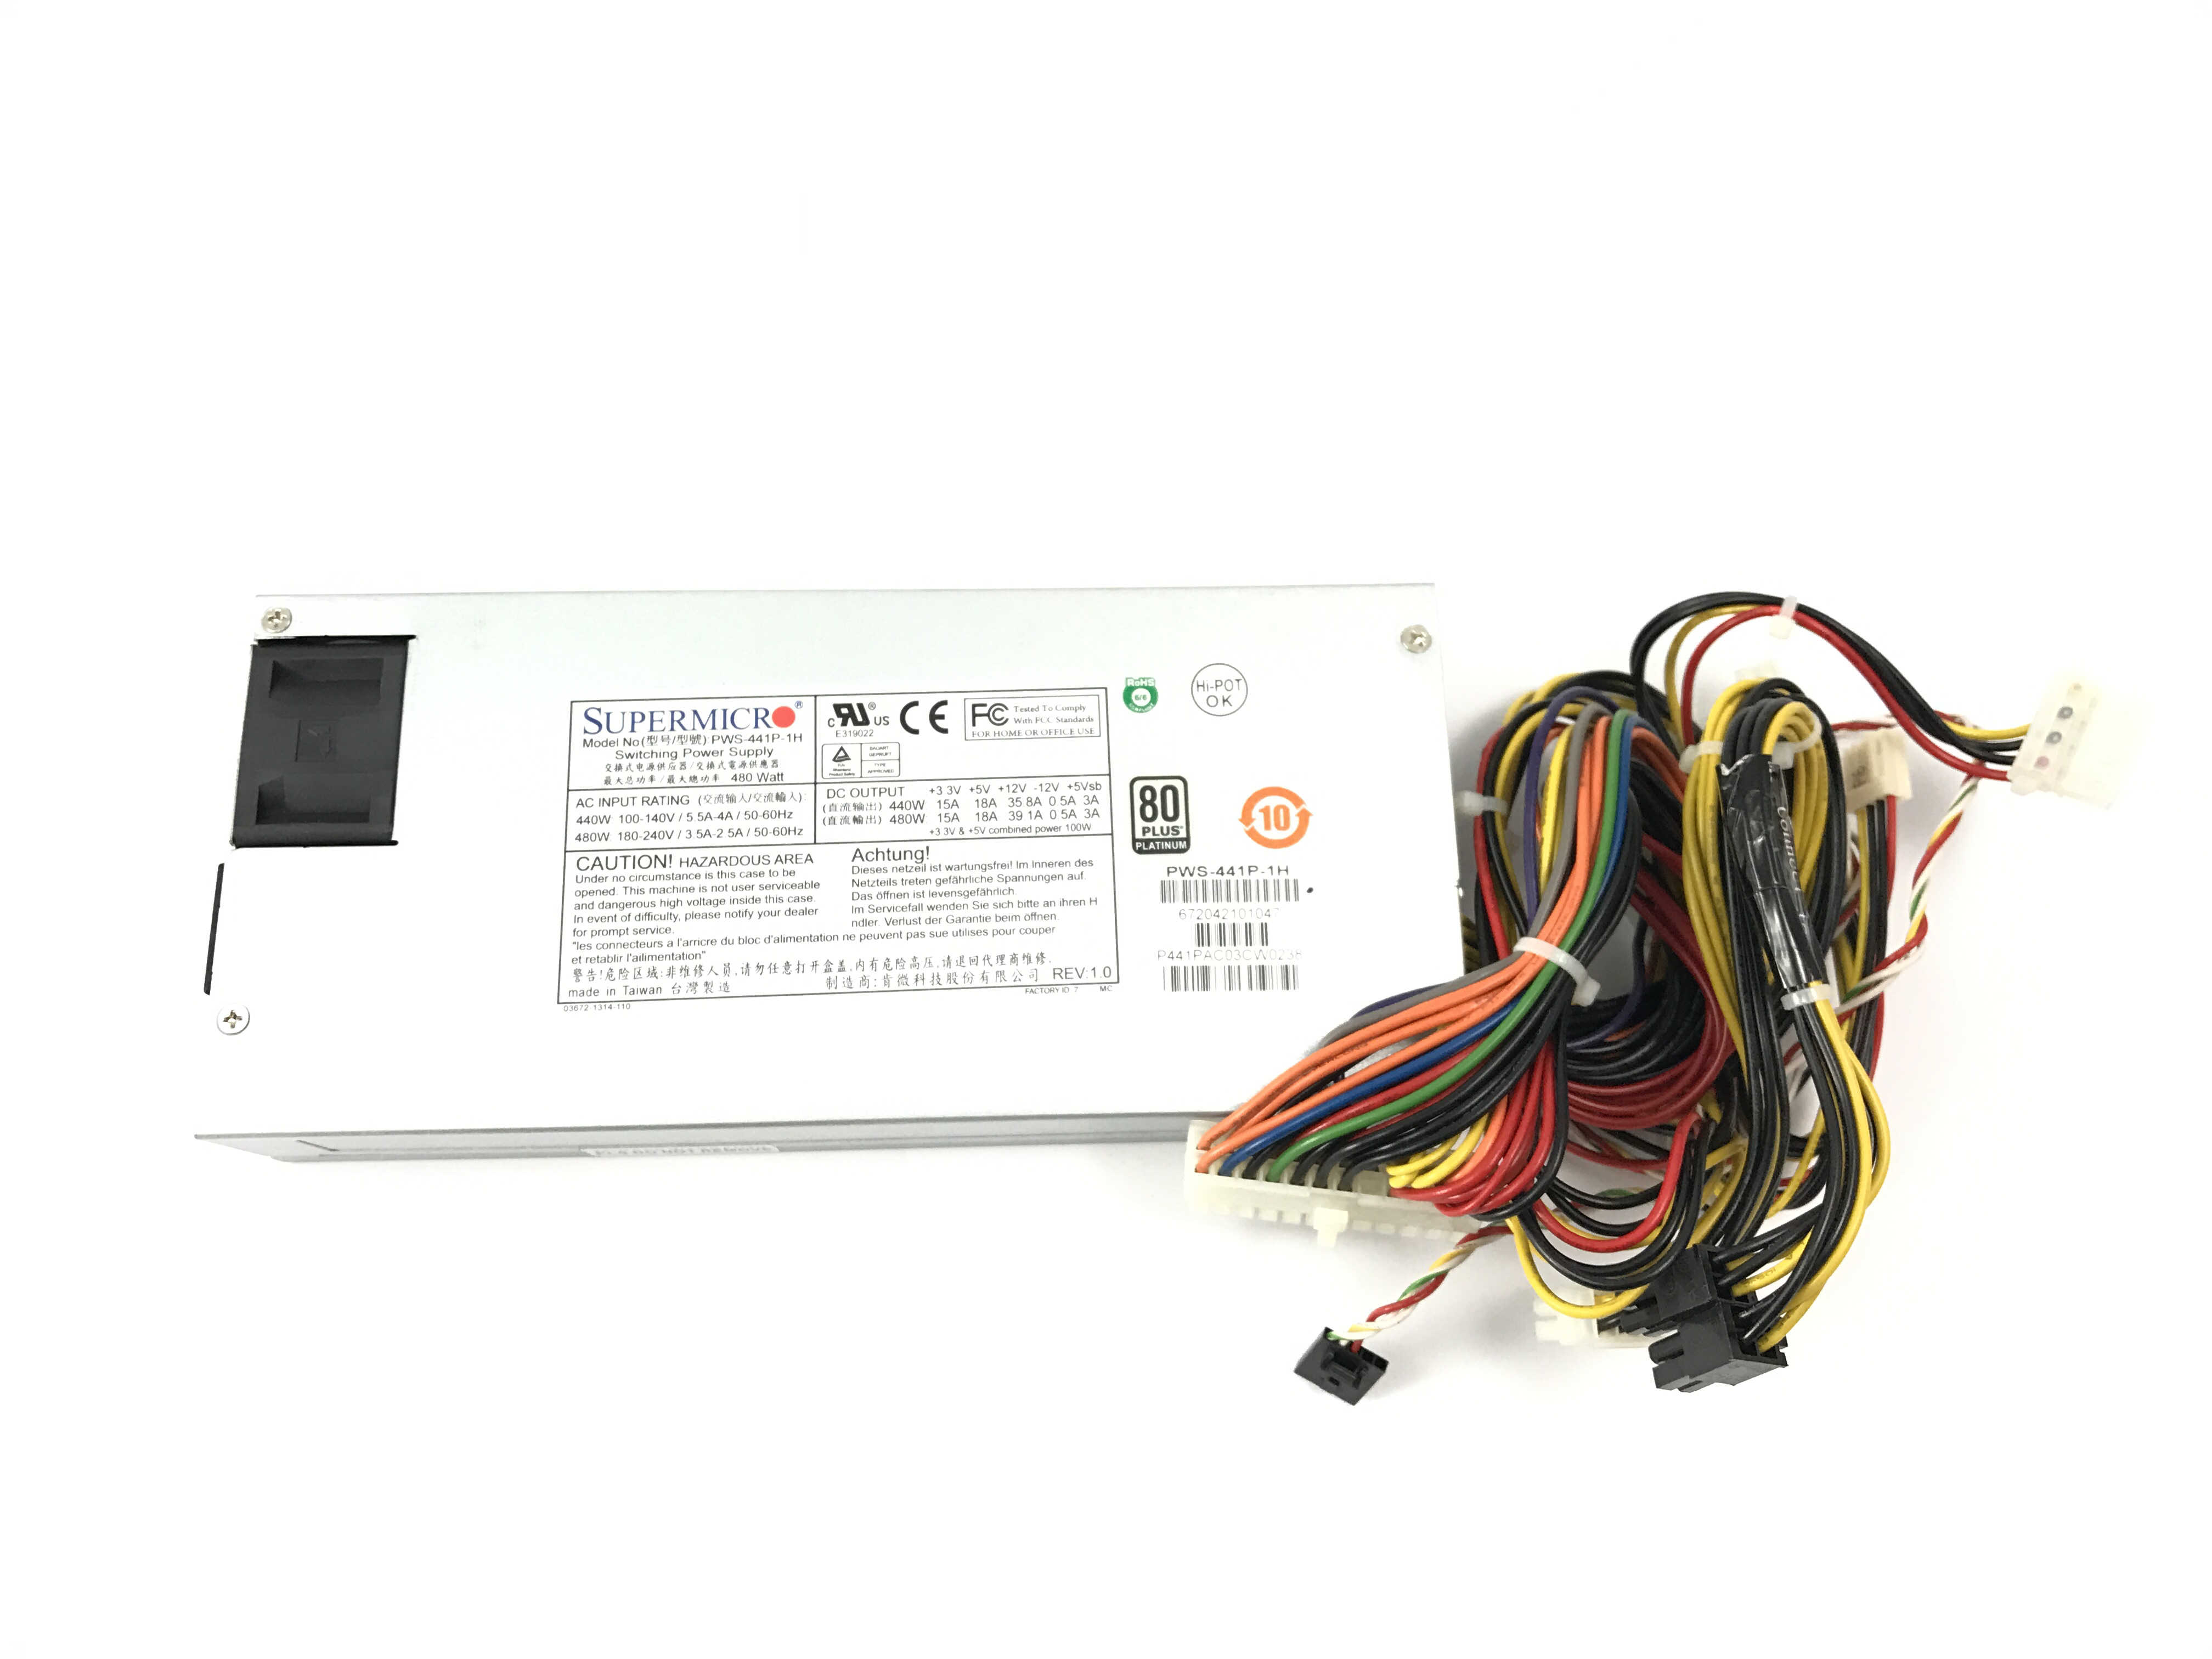 SUPERMICRO 440W / 480W 80 PLUS PLATINUM POWER SUPPLY (PWS-441P-1H)